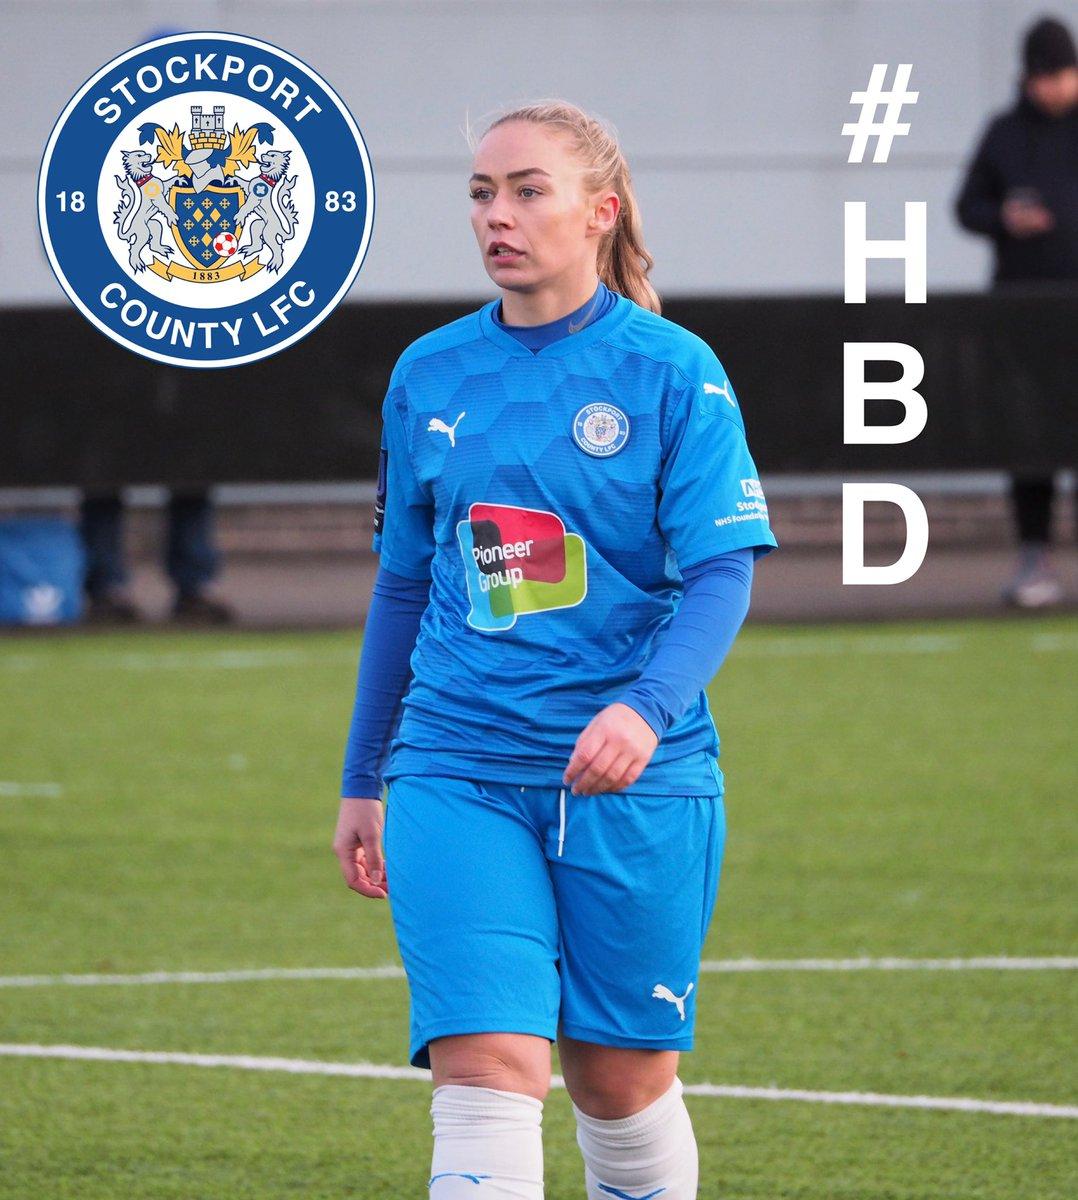 HAPPY BIRTHDAY : Happy Birthday to Our Development Team midfielder and Vice-Captain, Missy Von Bargen @MissyVonBargen_   Have a Great Day! 🥳🎂🍾🥂🎁🎉  🔵⚪️🎩 #UTH #FAWNL #HBD #womensfootball